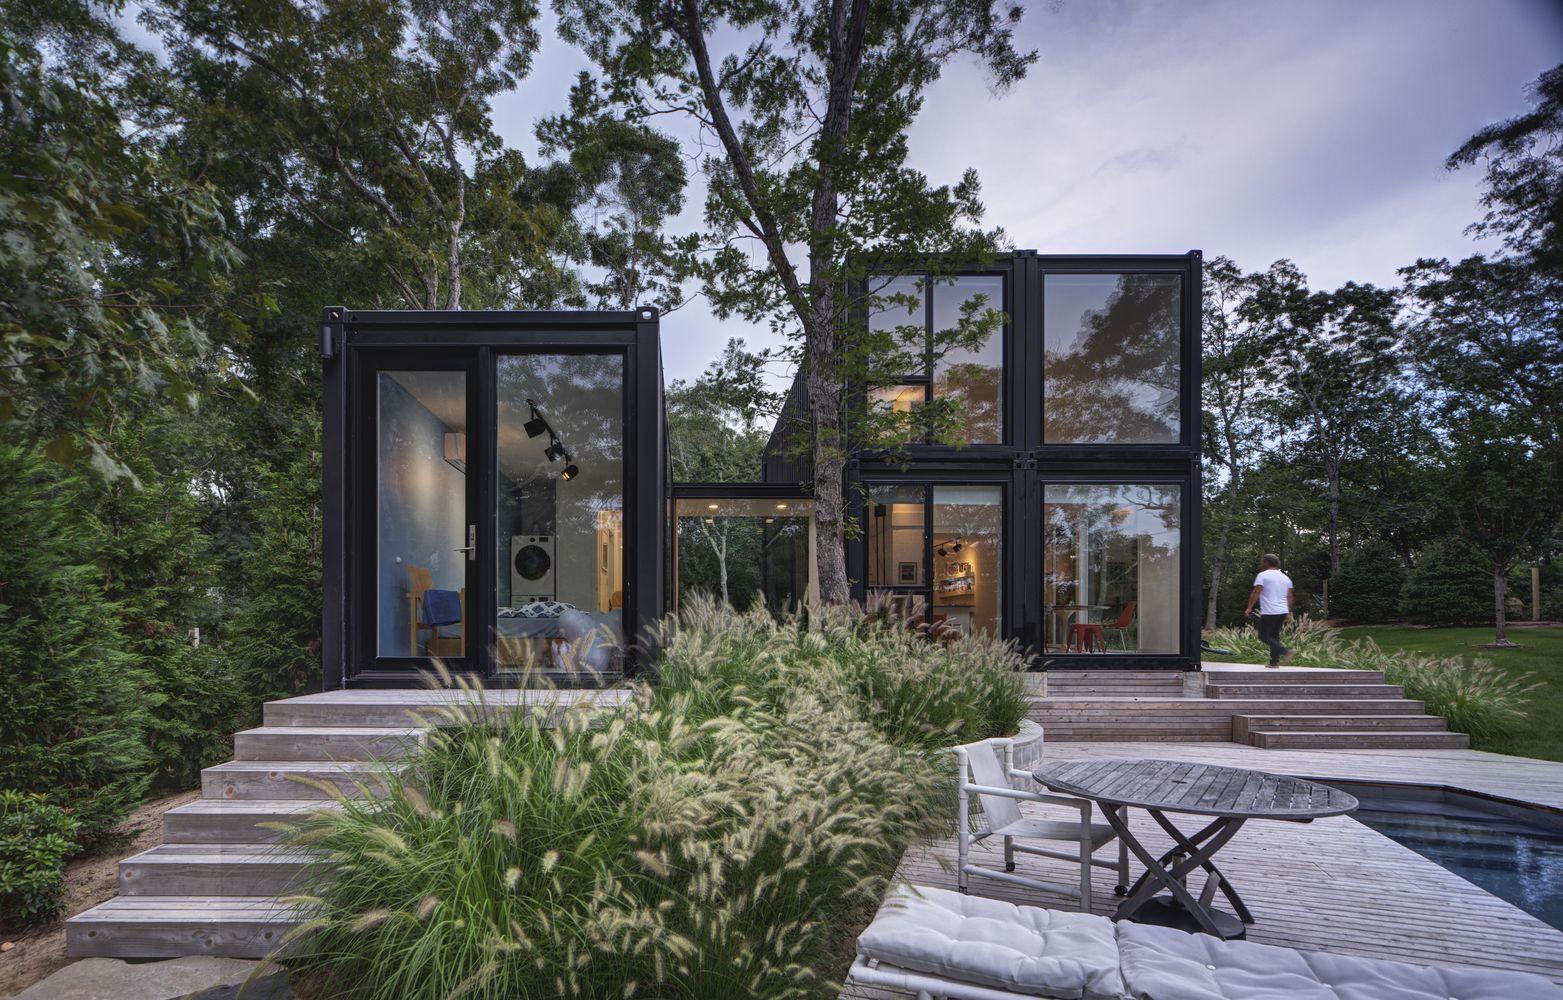 1_Amagansett Modular House_MB Architecture_Inspirationist